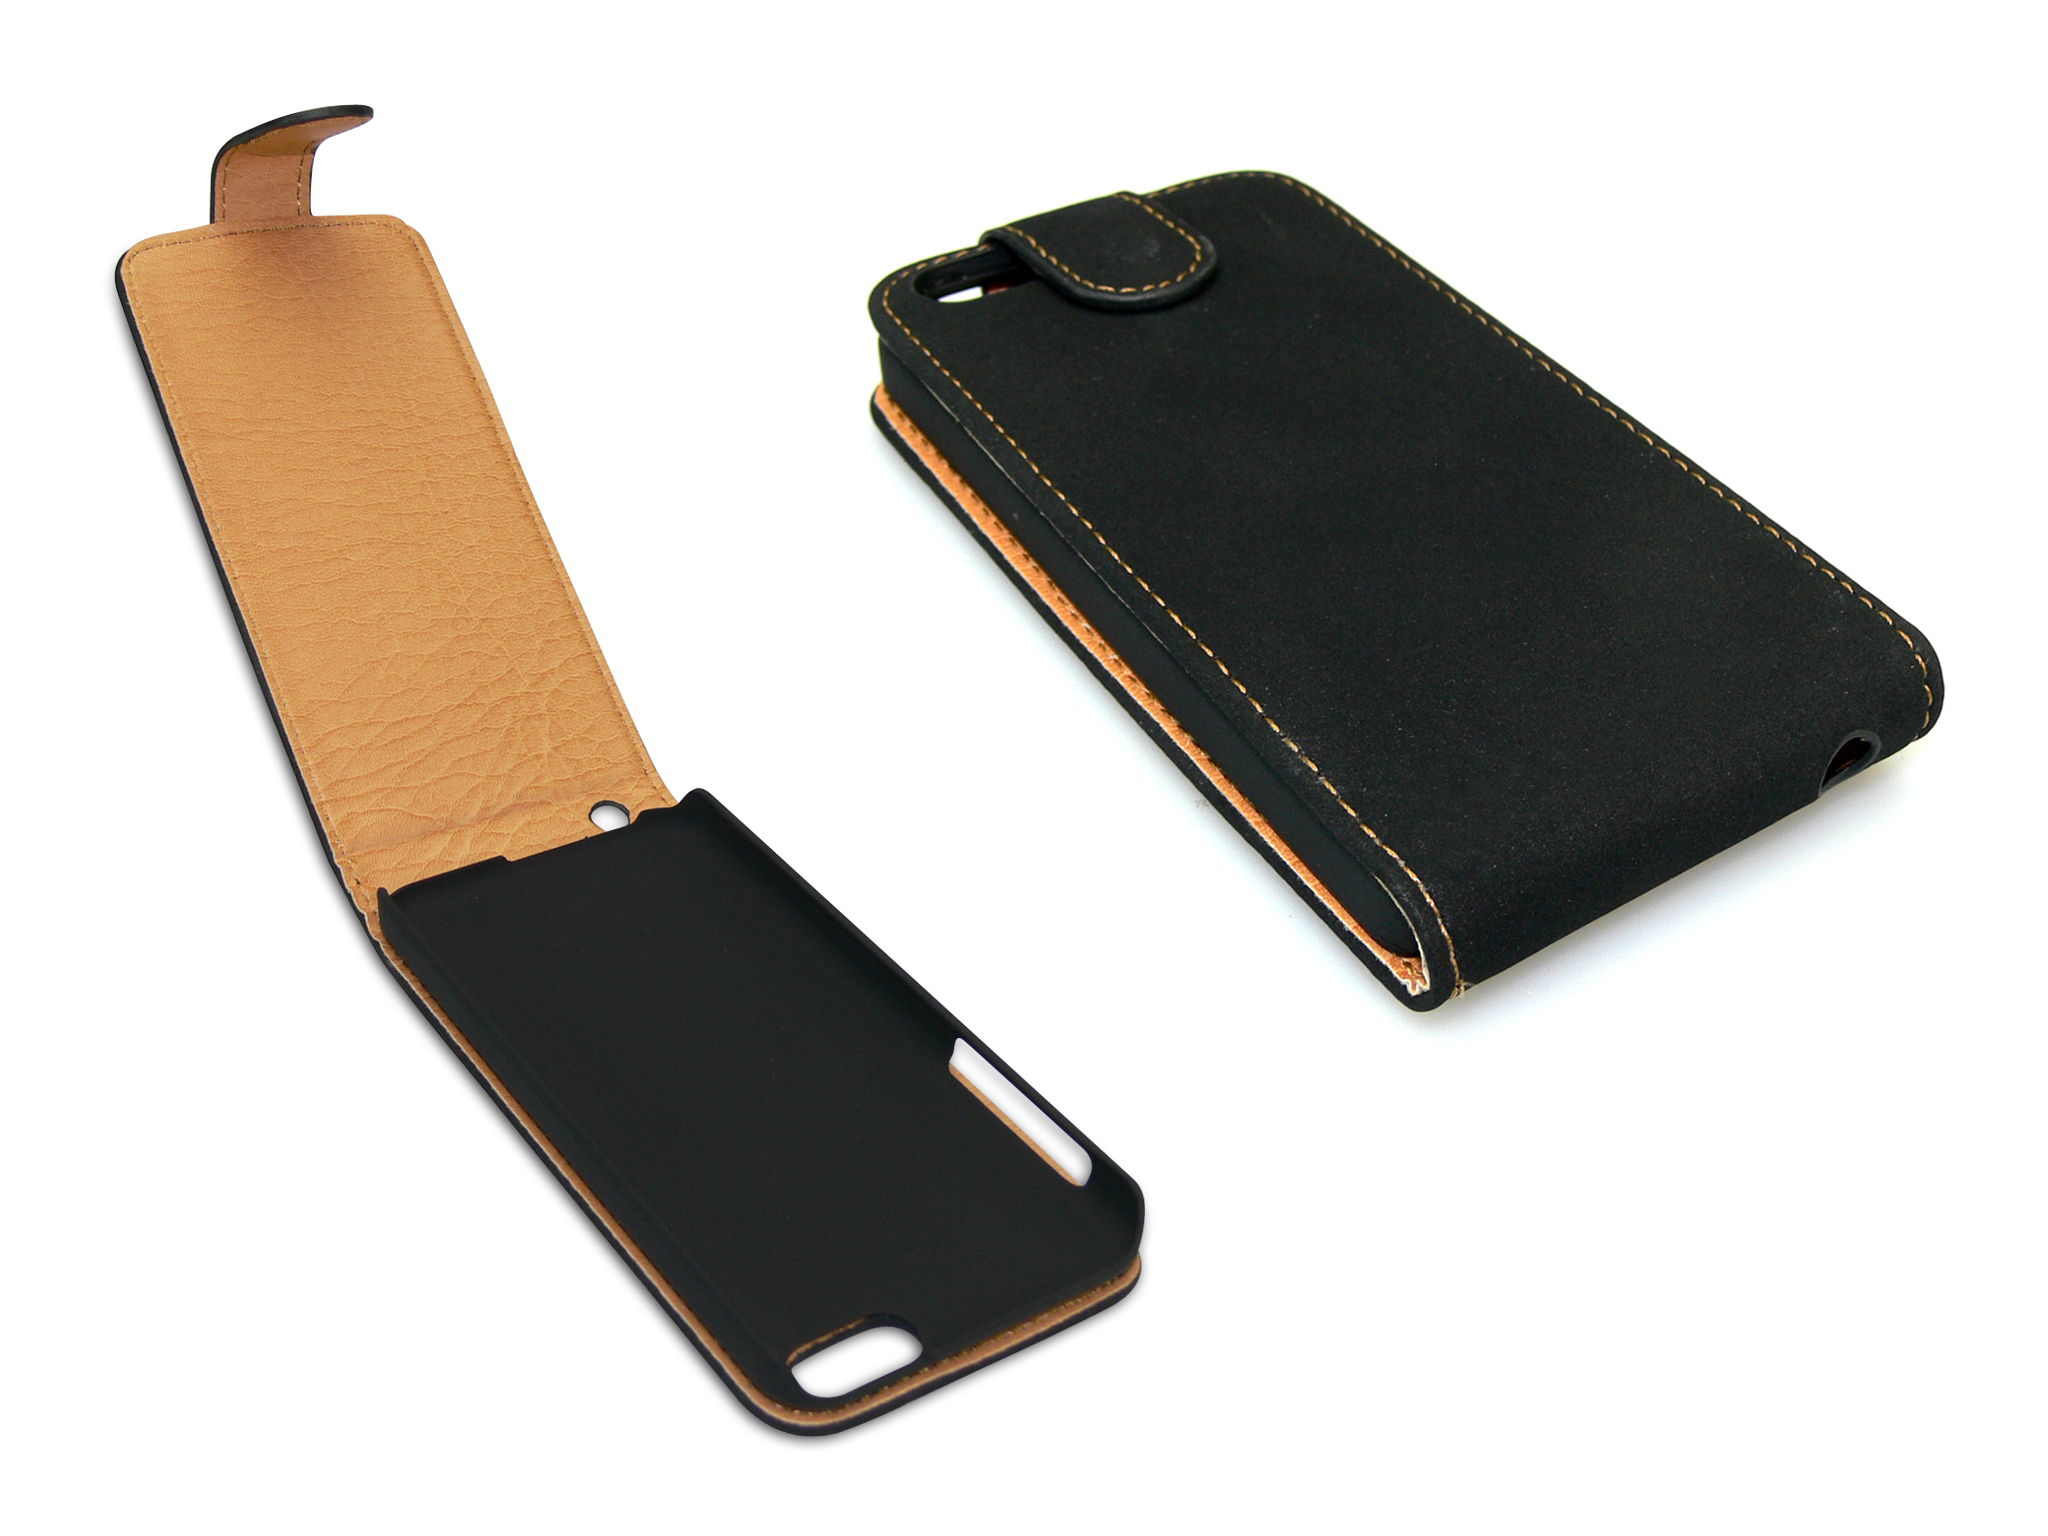 Flip Pouch iPh 5C skin Black